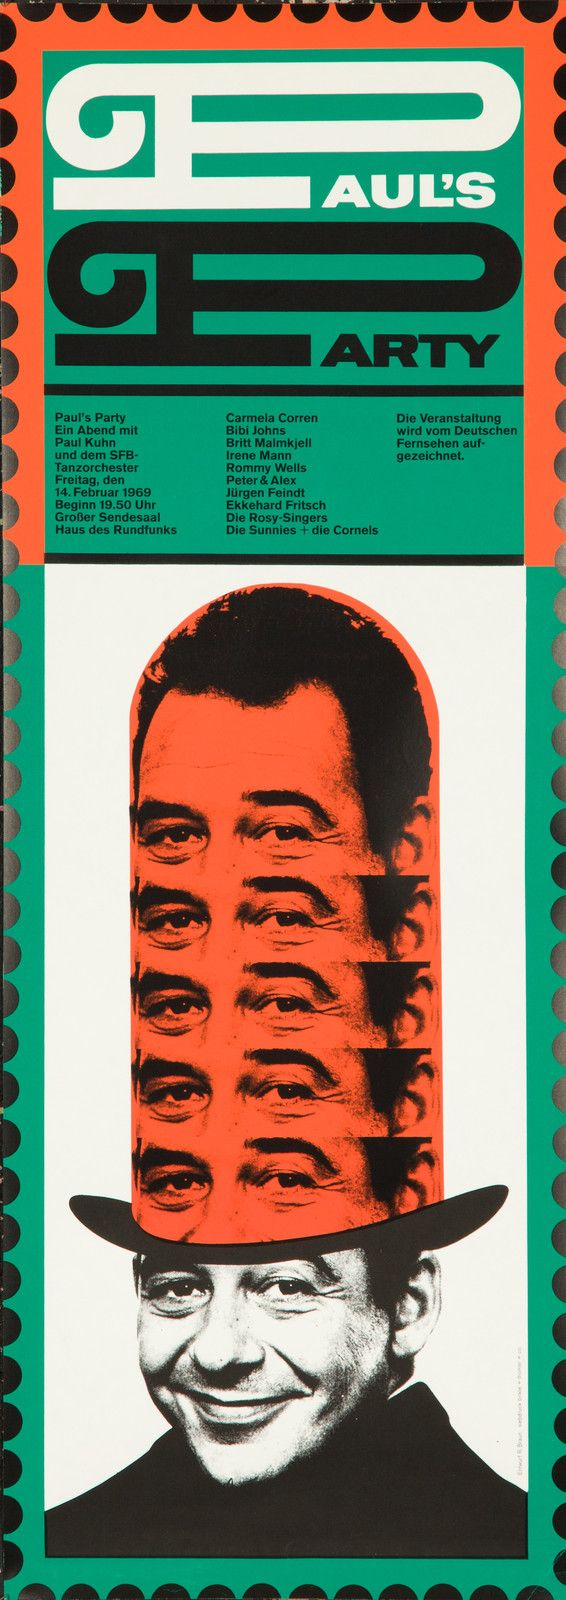 Original Vintage Poster Paul's Party German Surreal Photomontage 1960s Mod Pop | eBay